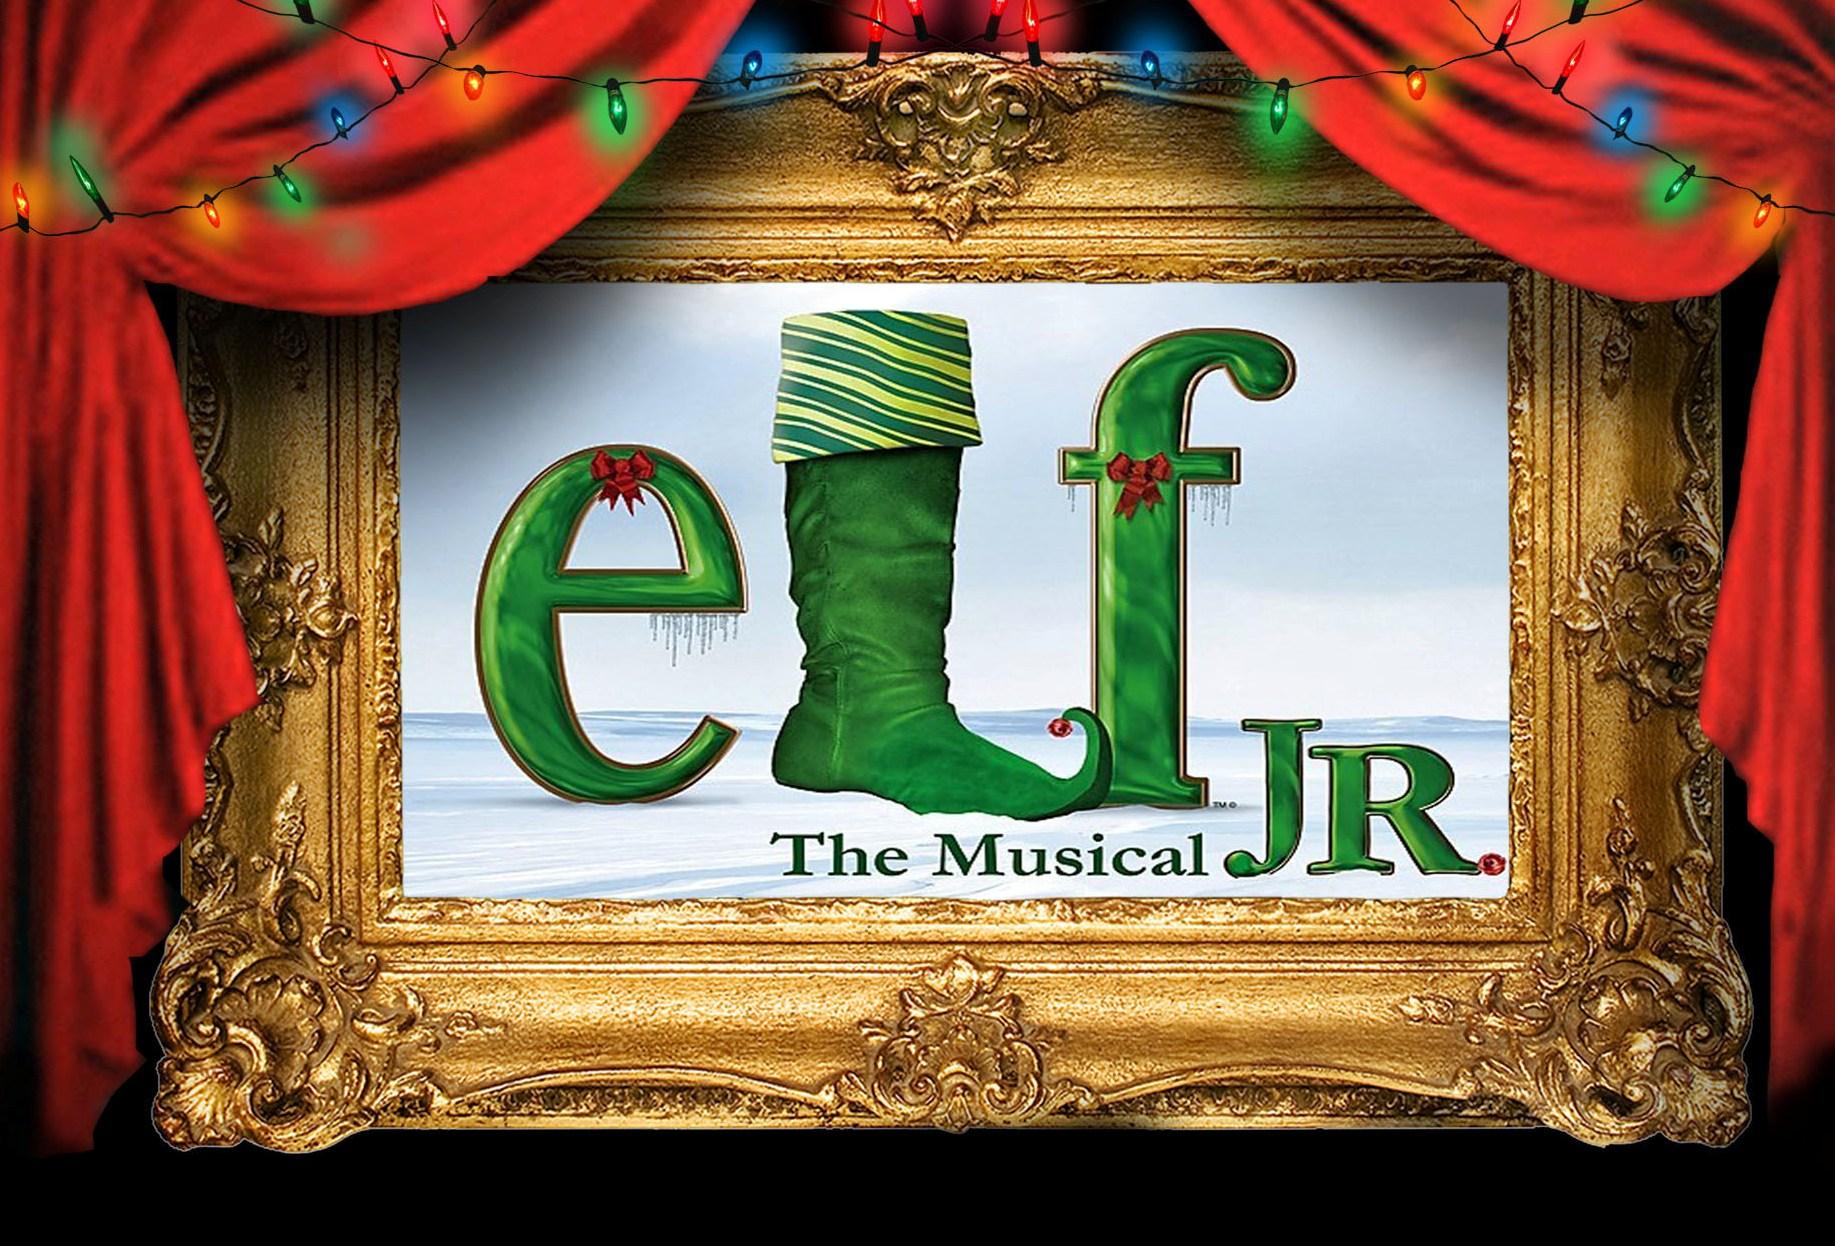 Drama department presents Elf Jr., The Musical